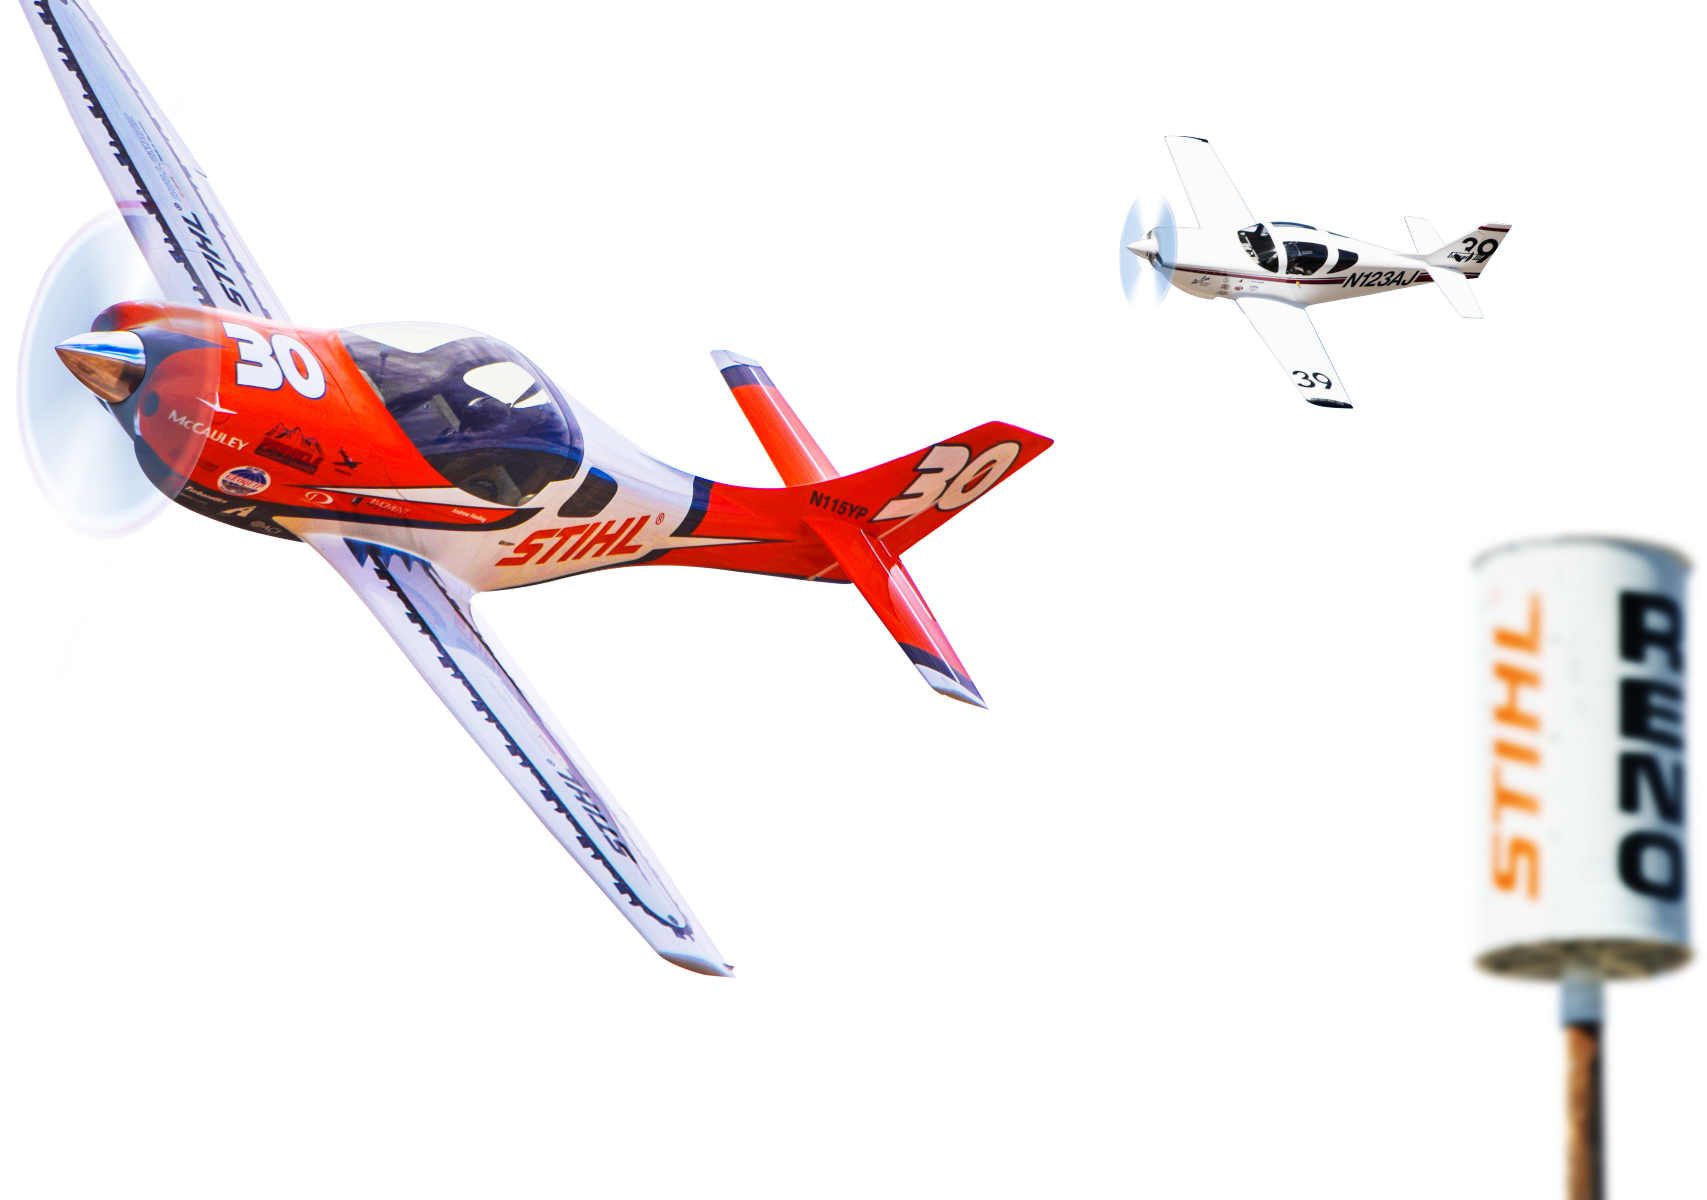 STIHL National Championship Air Races | Reno Air Races